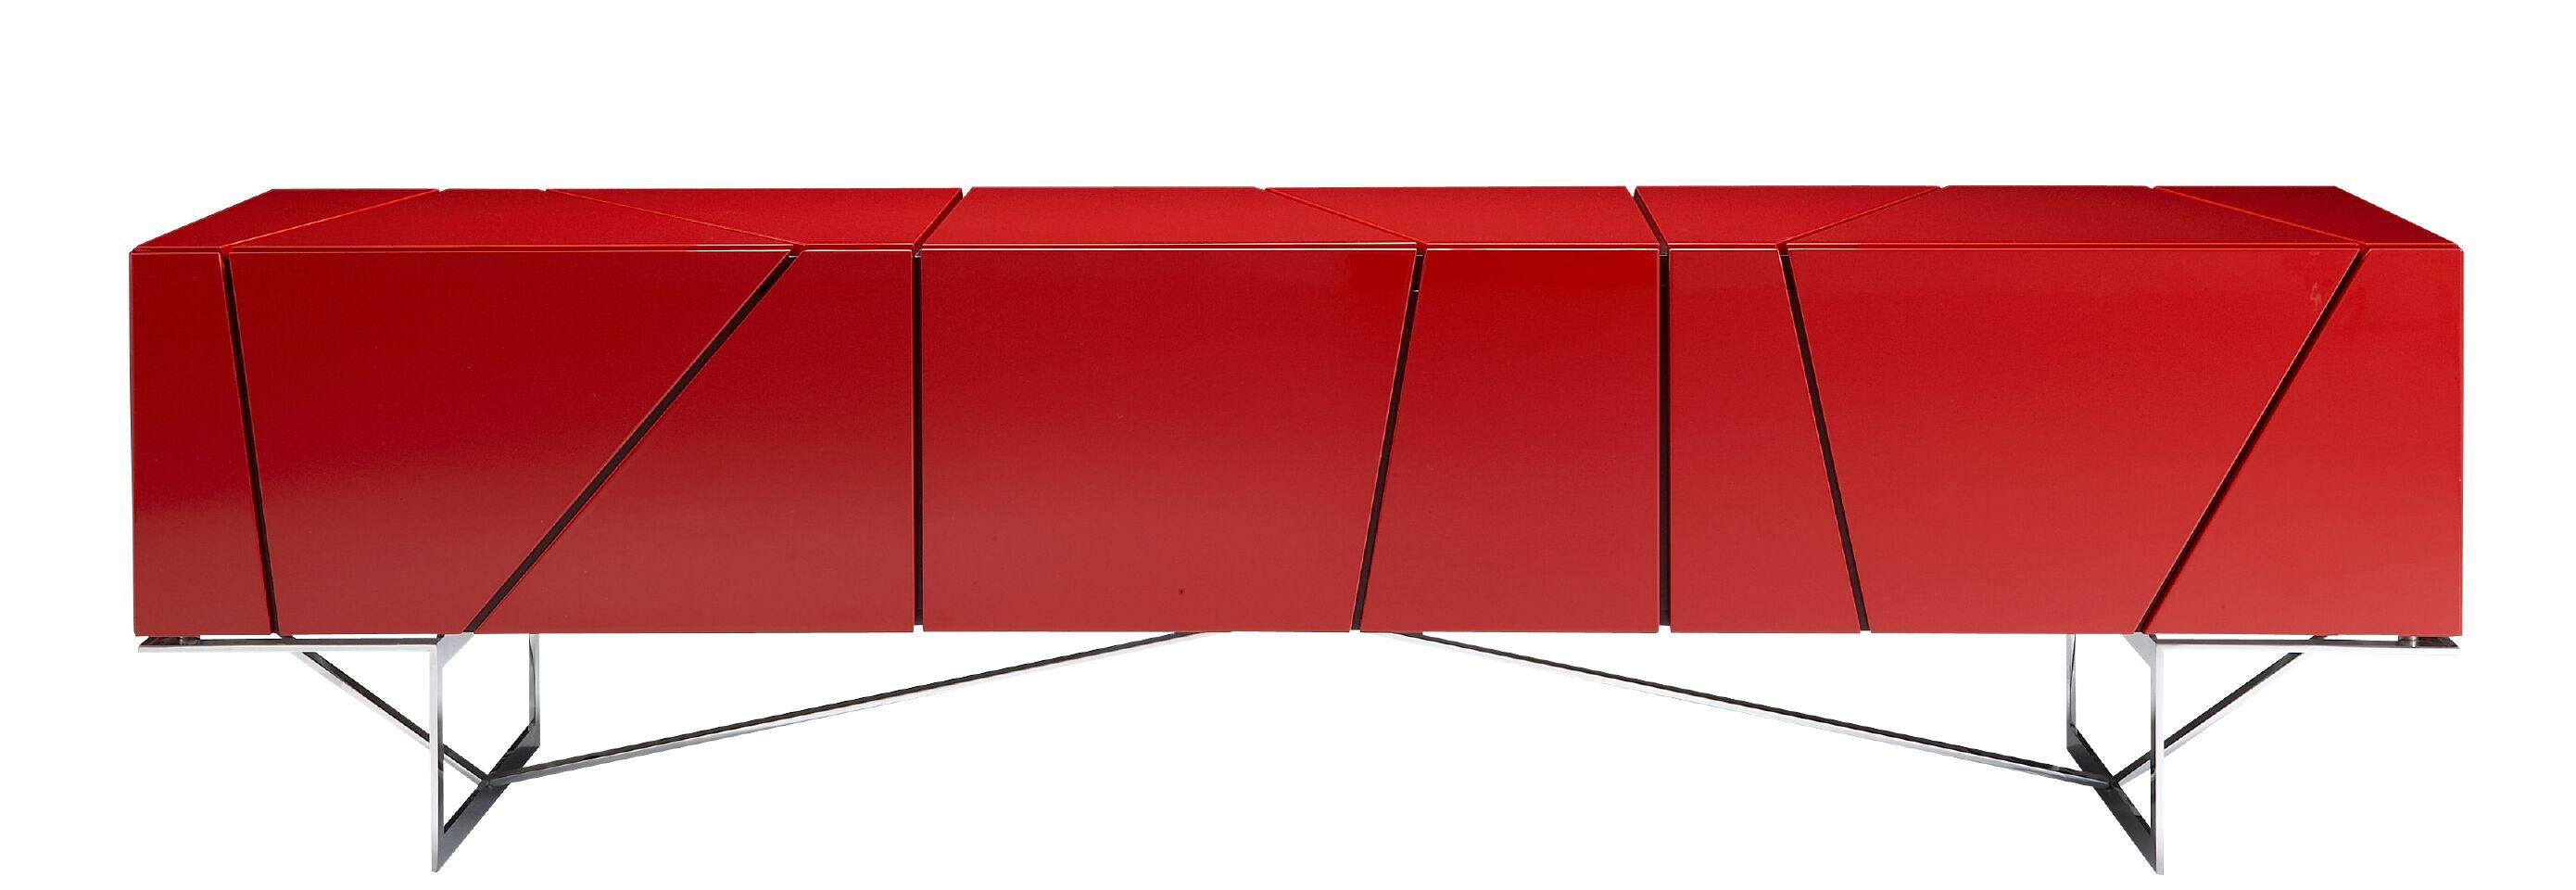 mobiliario officio mondo. Black Bedroom Furniture Sets. Home Design Ideas